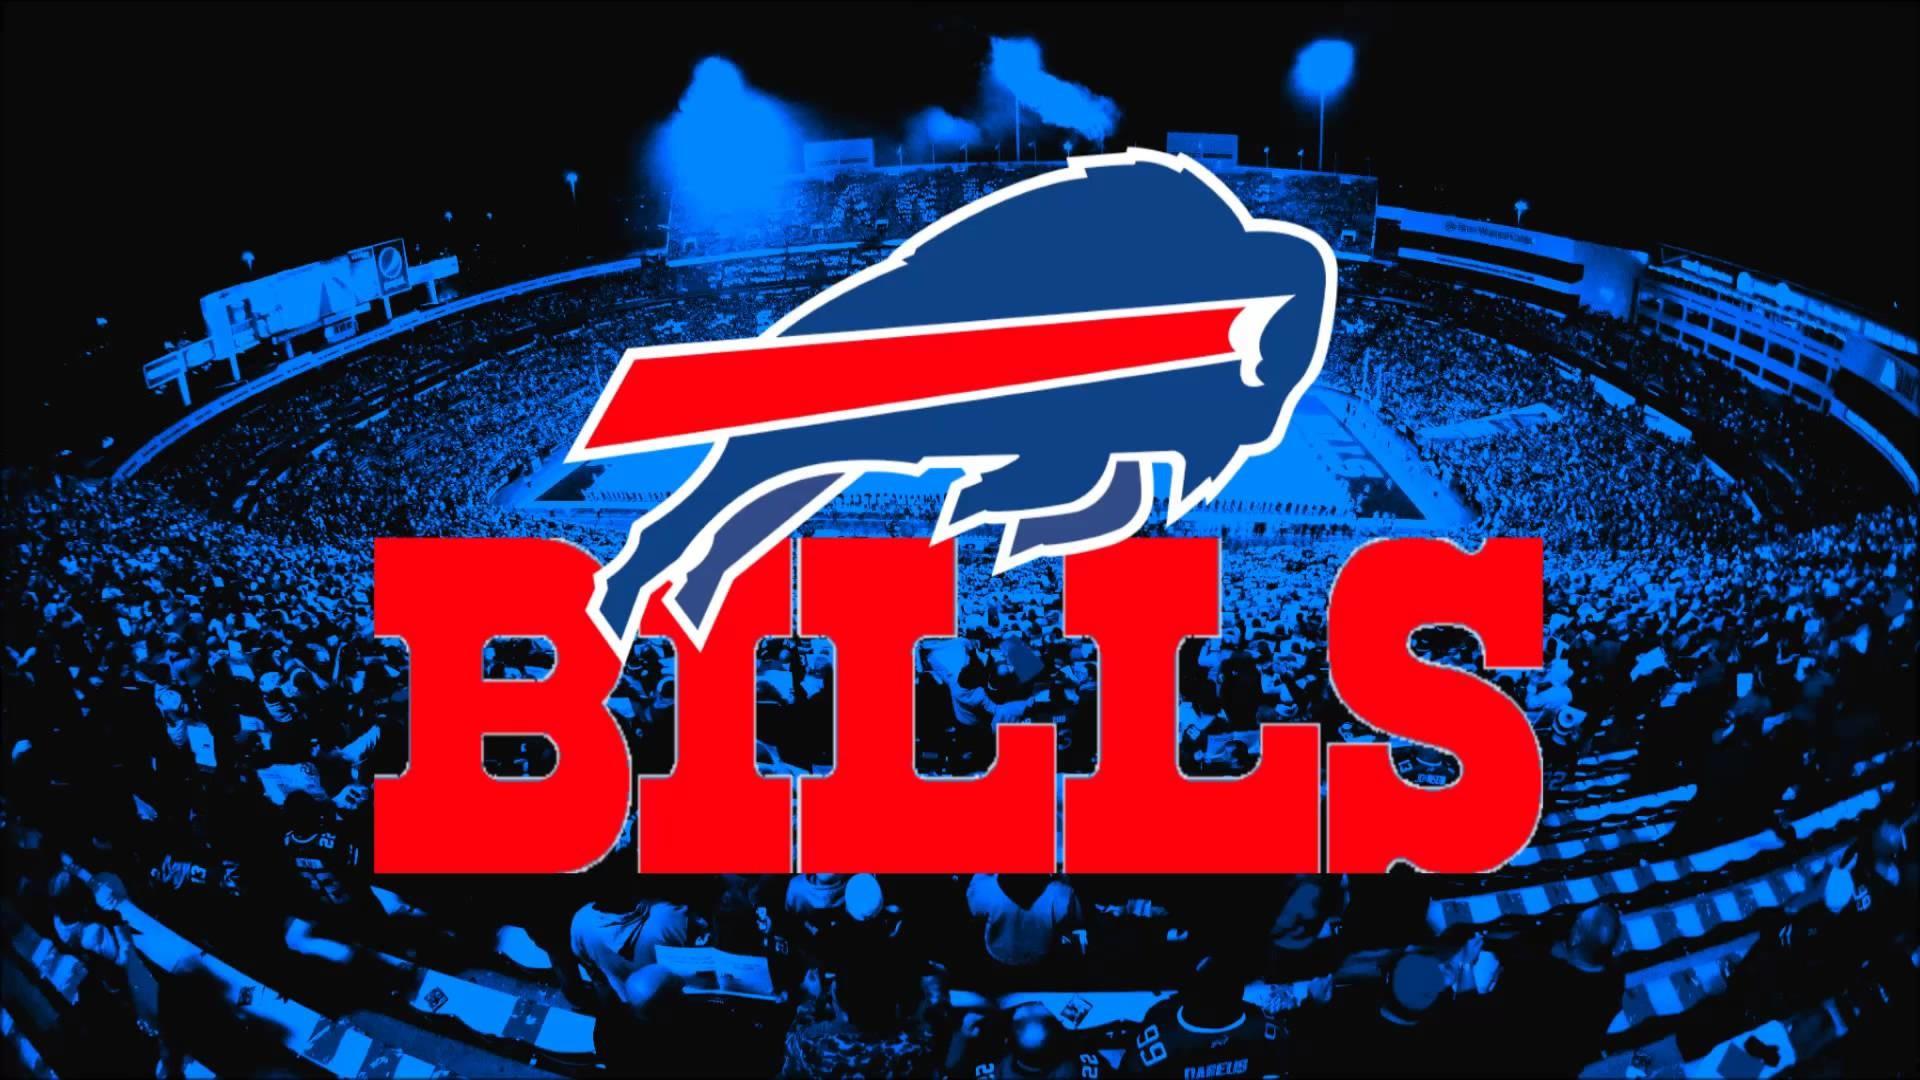 Buffalo Bills Wallpaper Screensavers (70+ Images